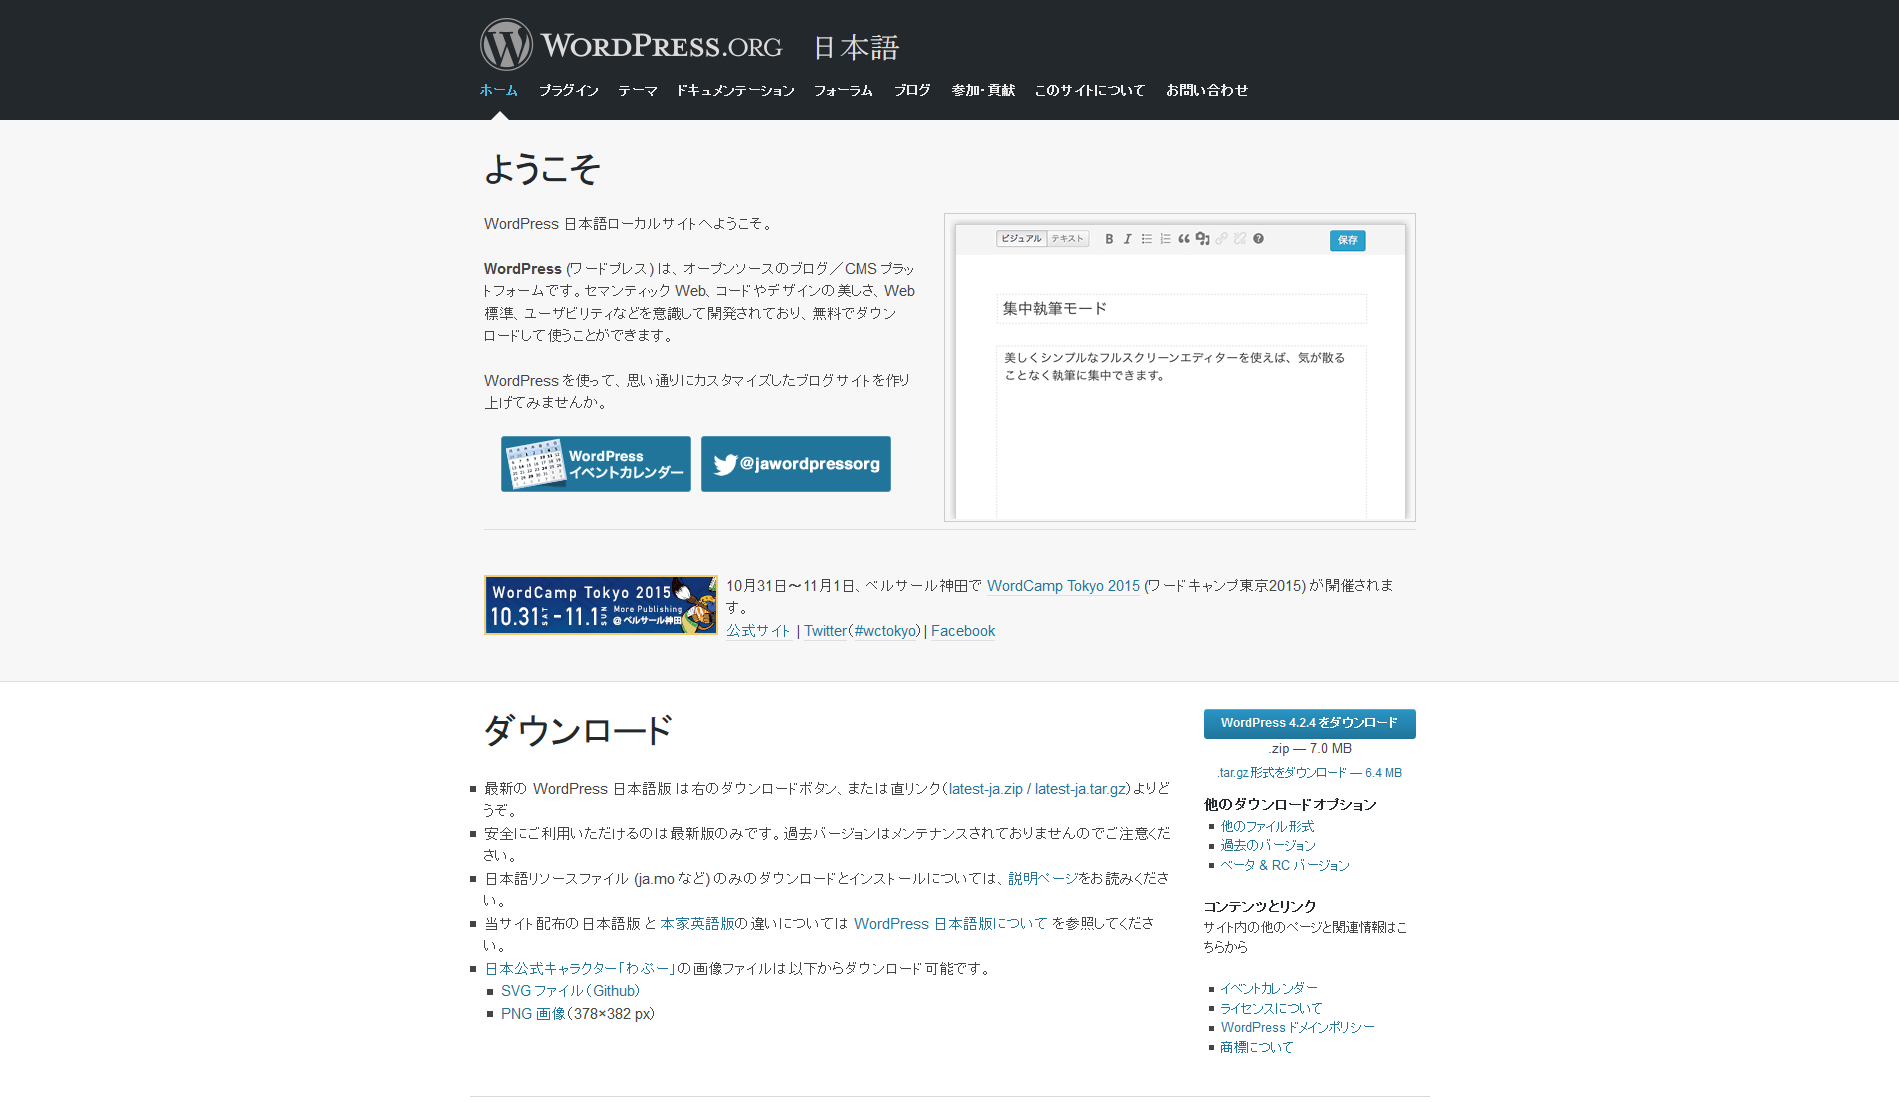 WordPress 日本語 ホーム